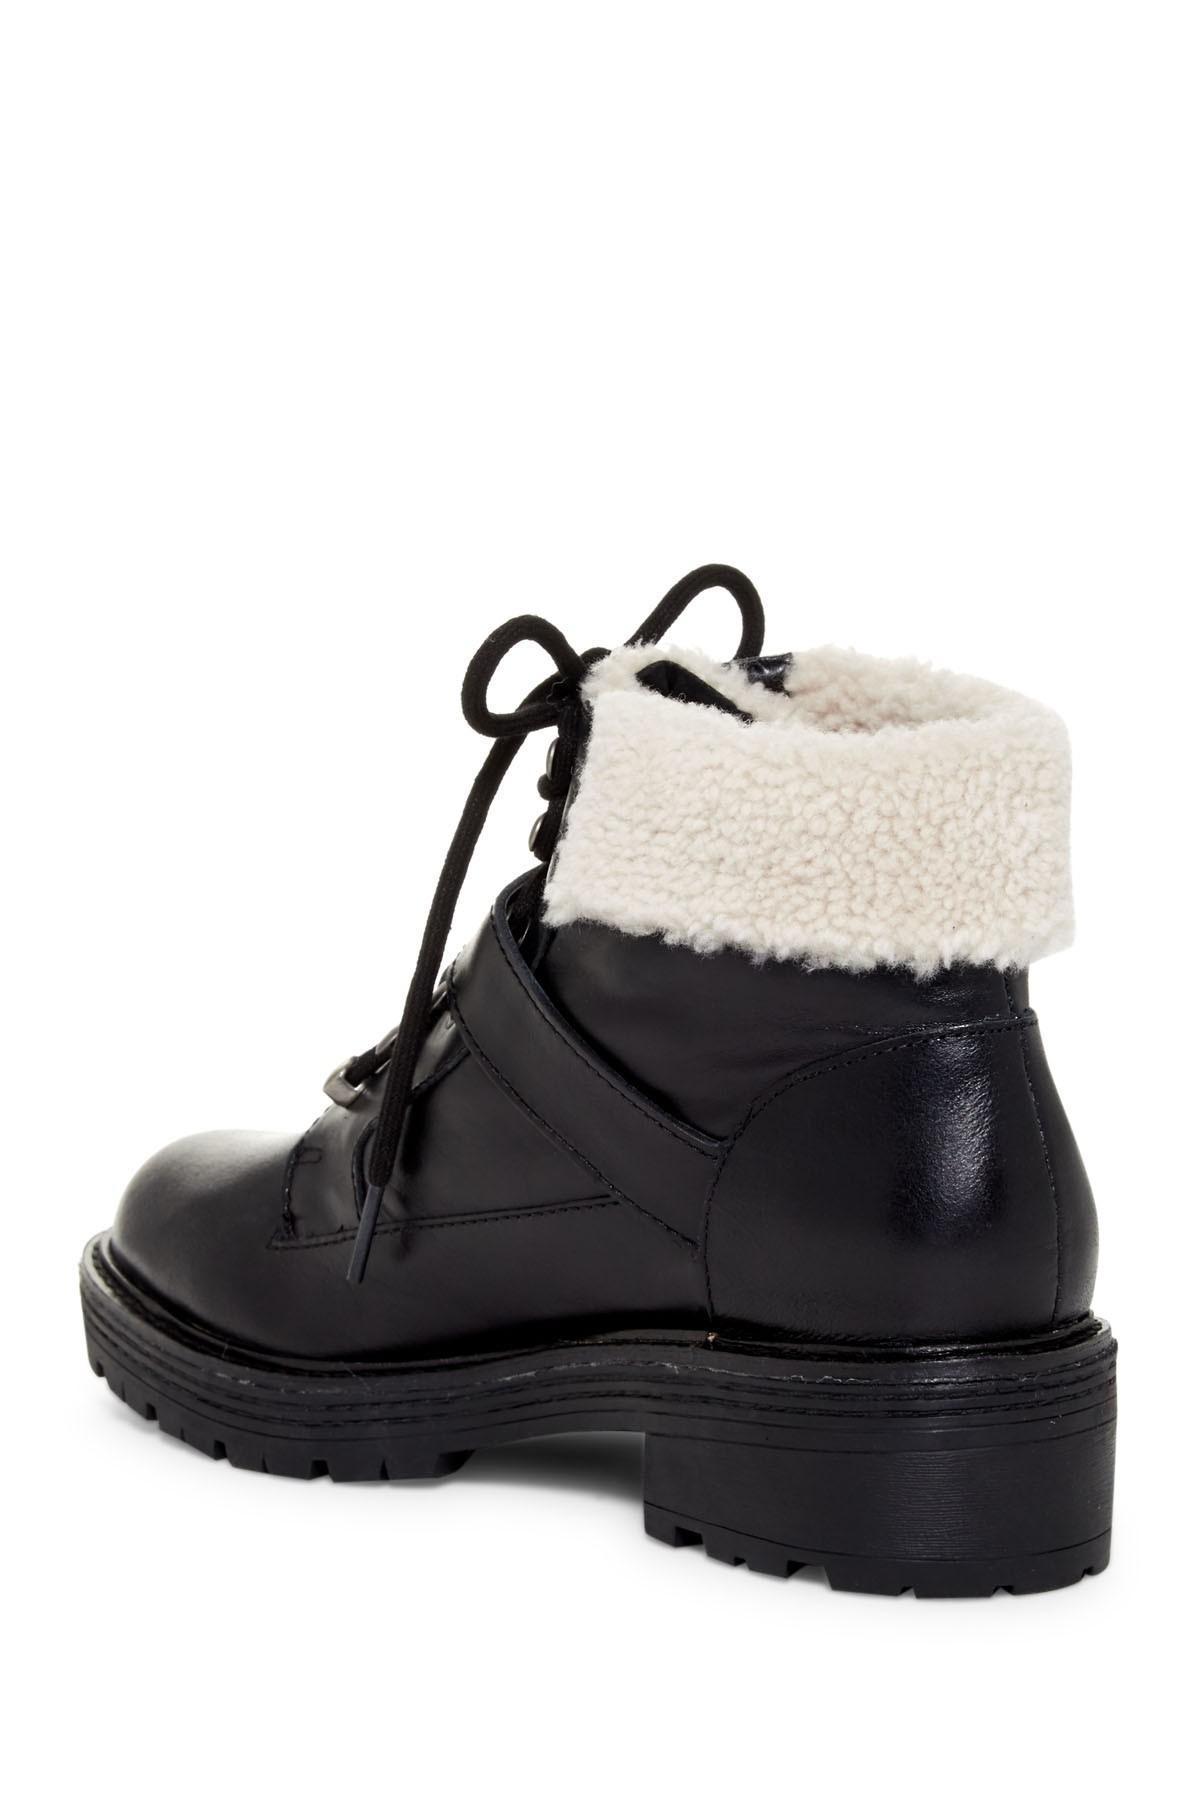 Women S Lug Sole Shoes